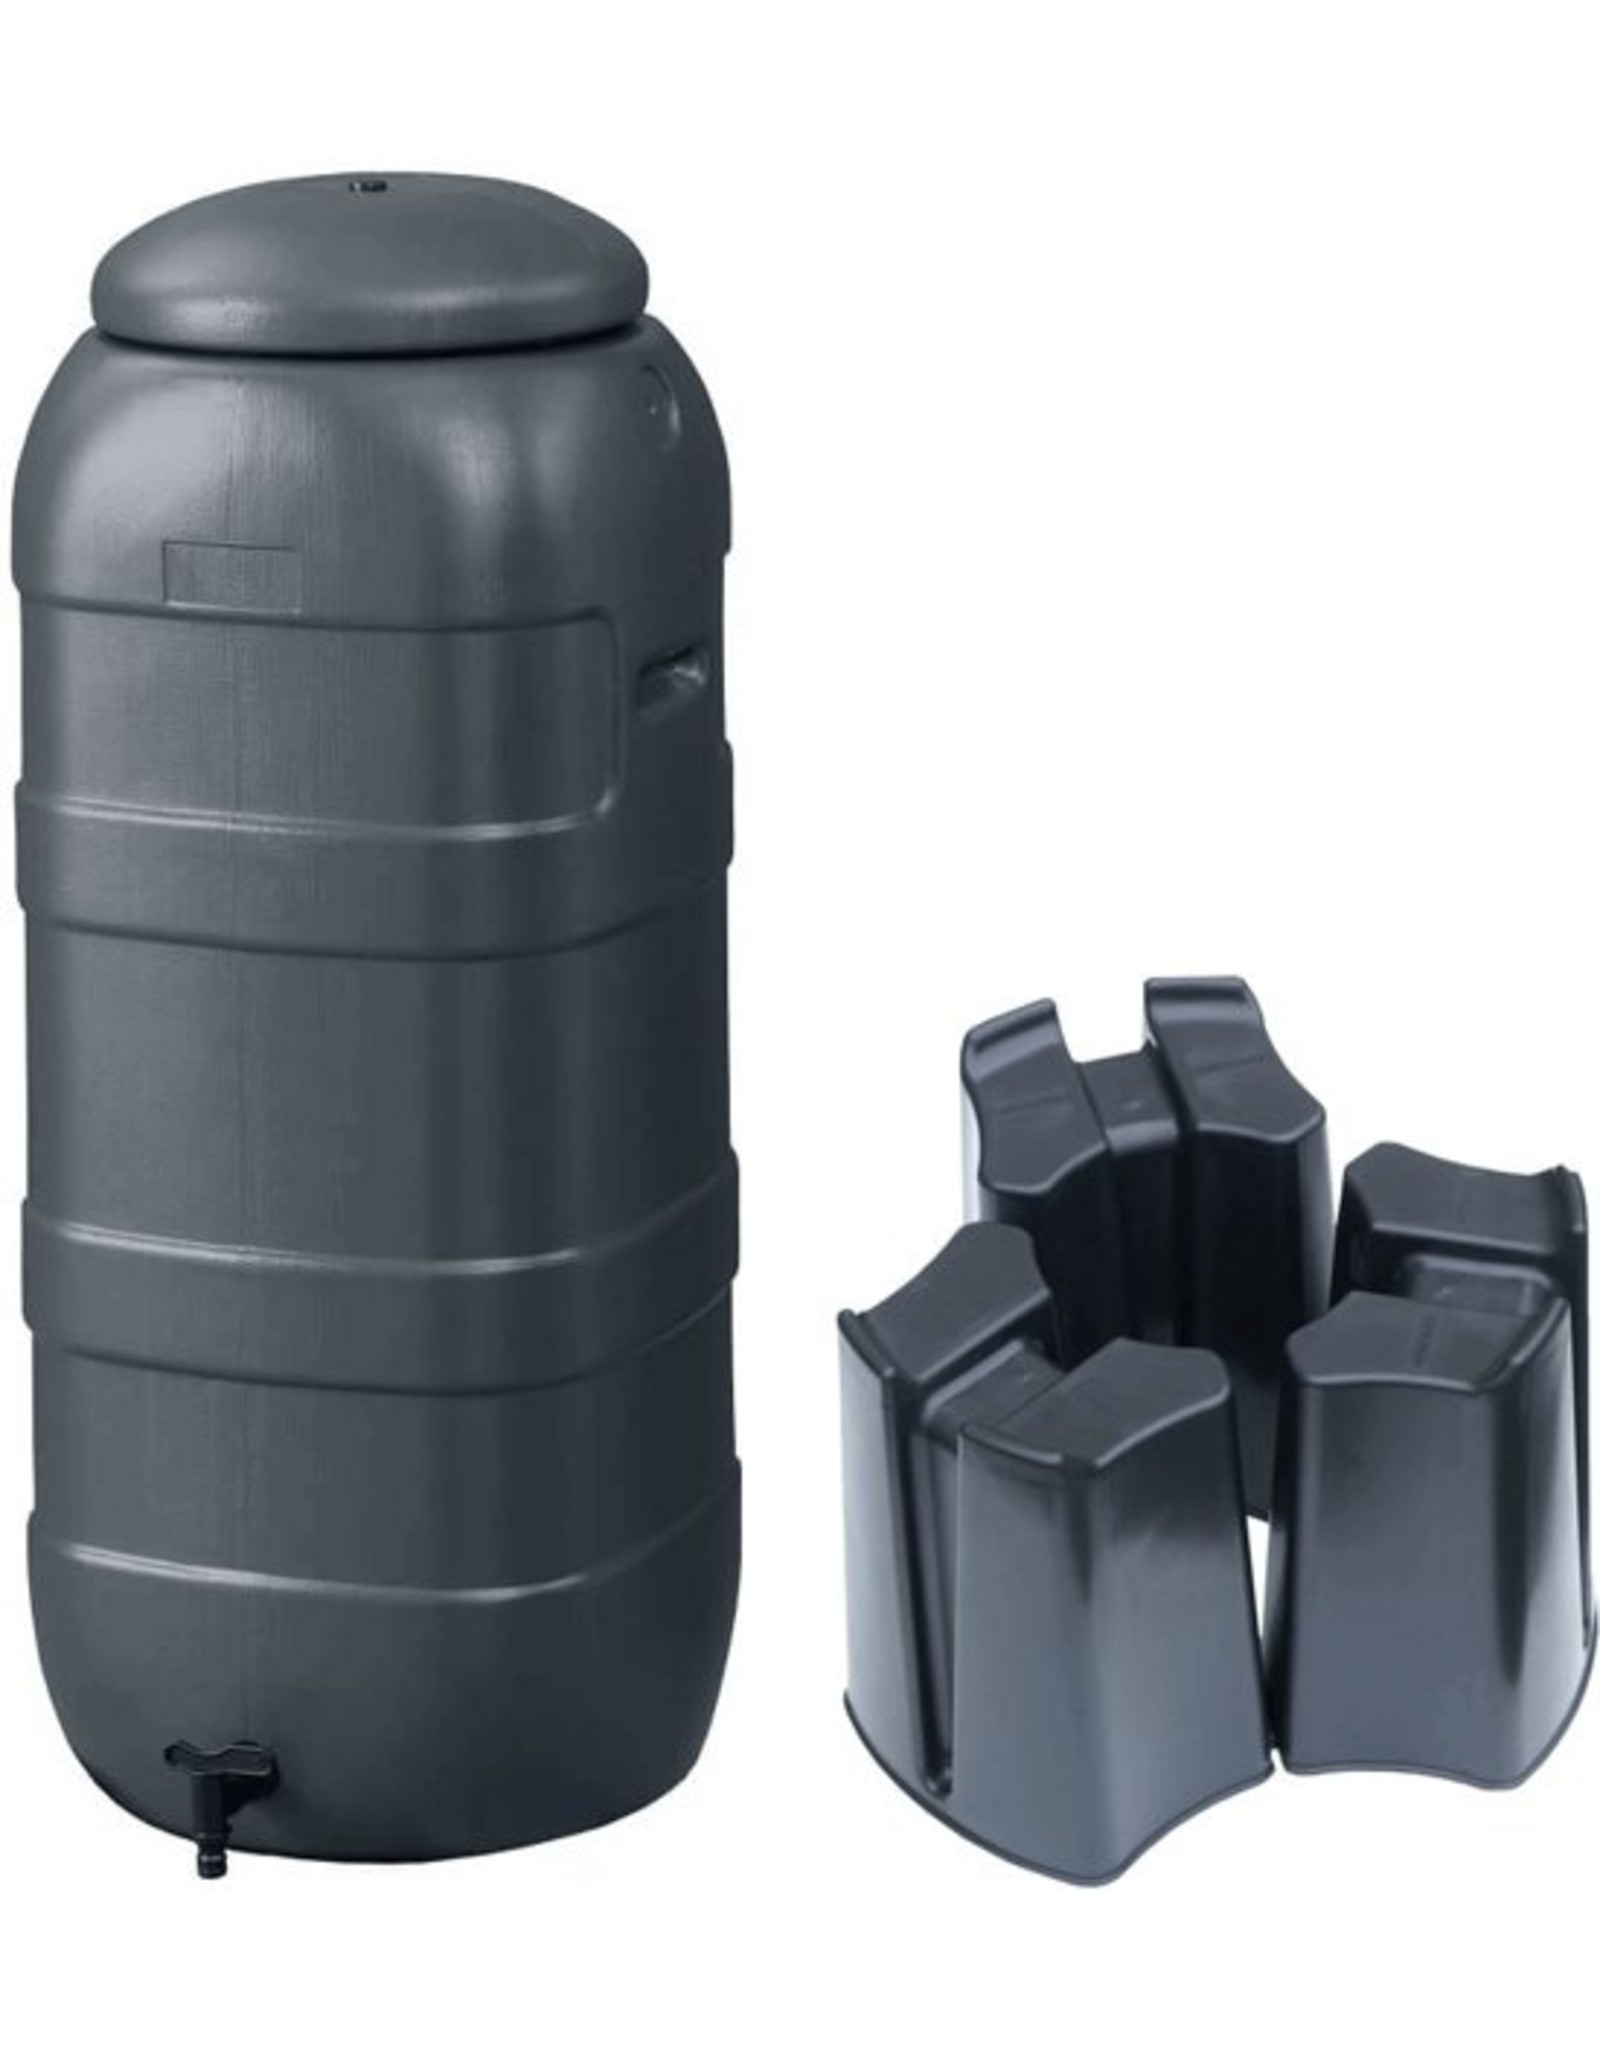 BeGreen Mini Rainsaver 100 liter grijs (Set)